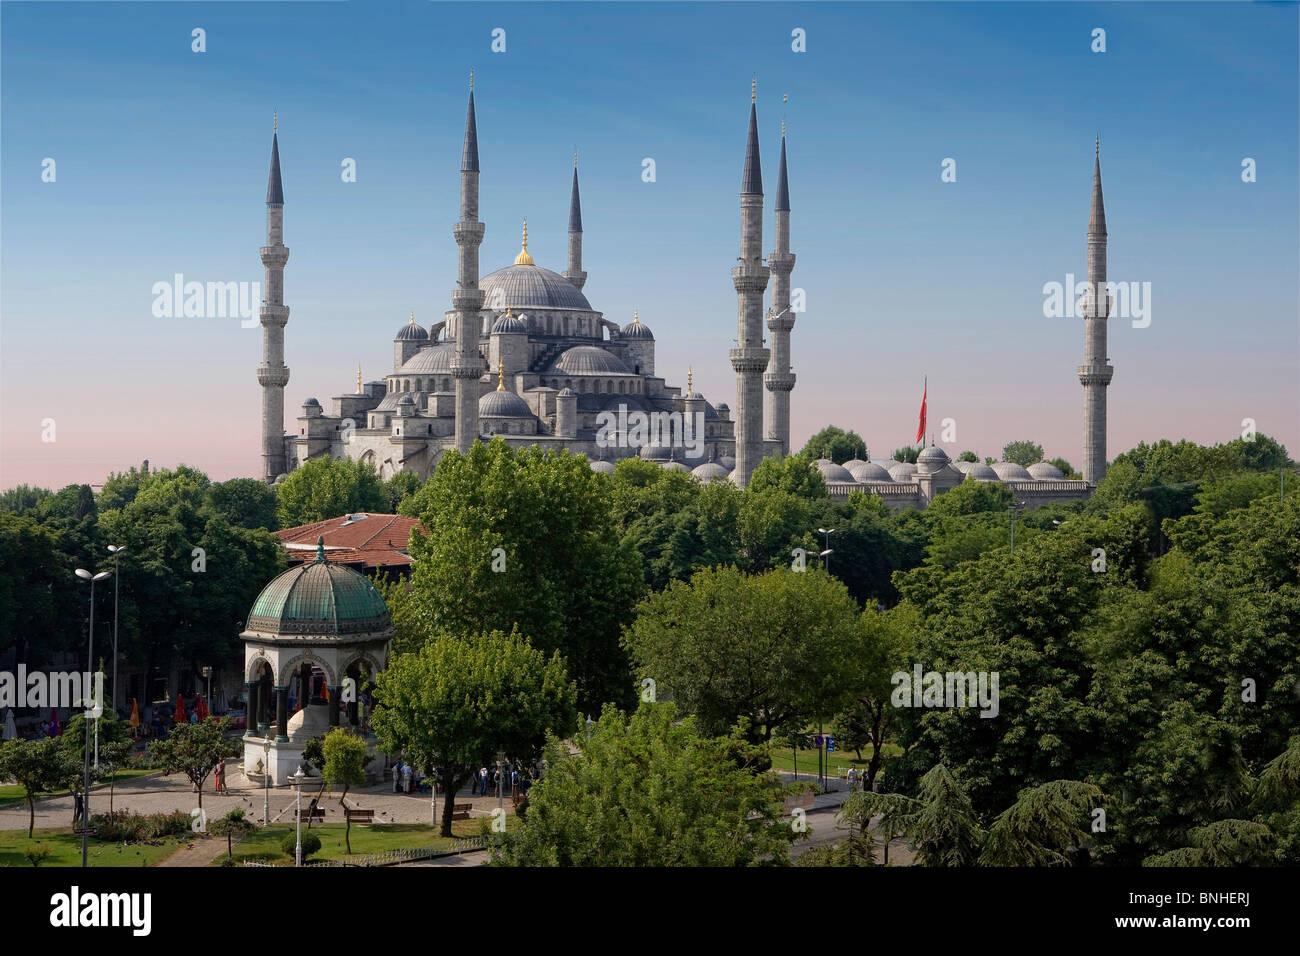 Juni 2008 Türkei Istanbul Stadt blaue Moschee Sultan Ahmed Mosque Stockbild